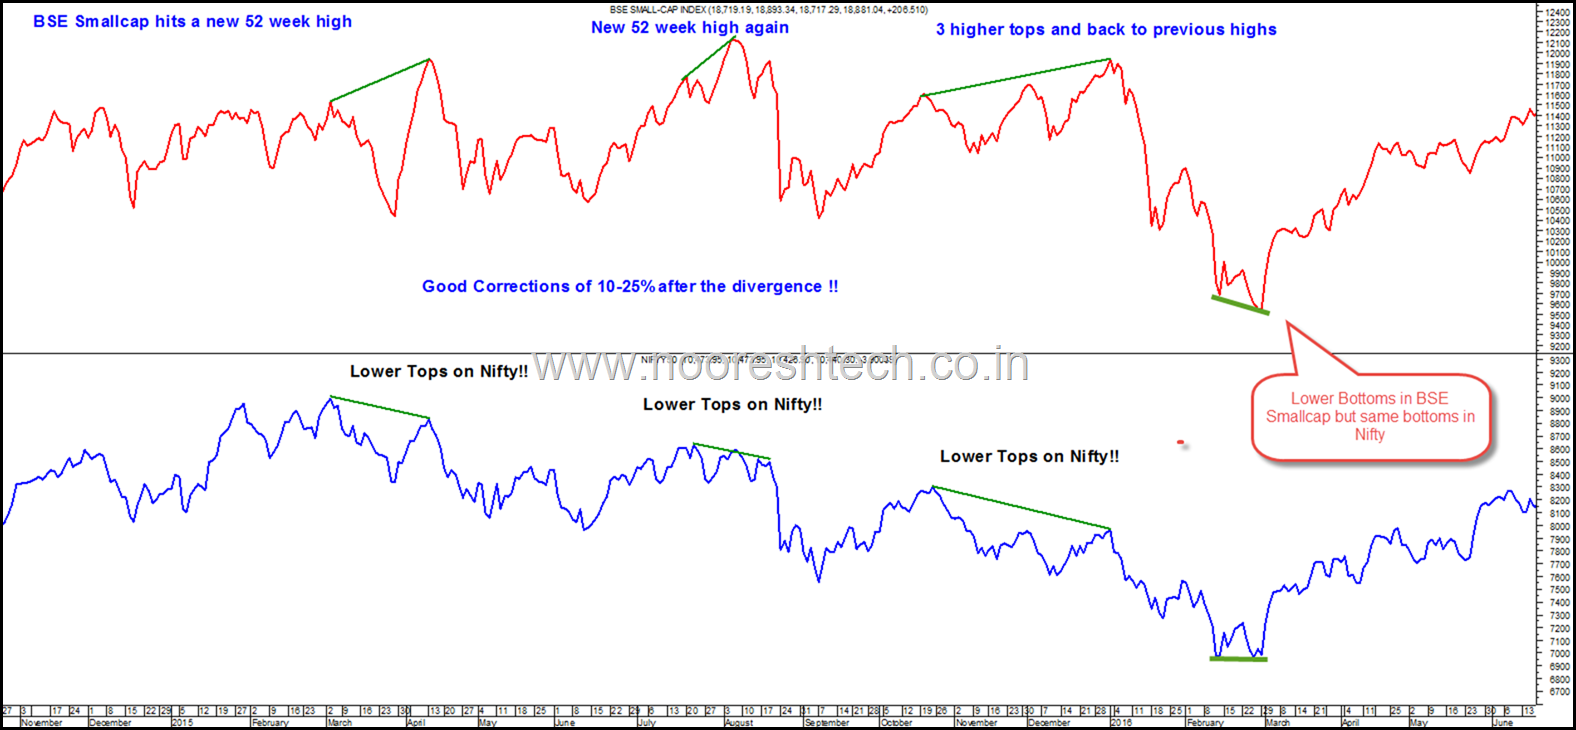 BSE Smallcap Index 2015-2016